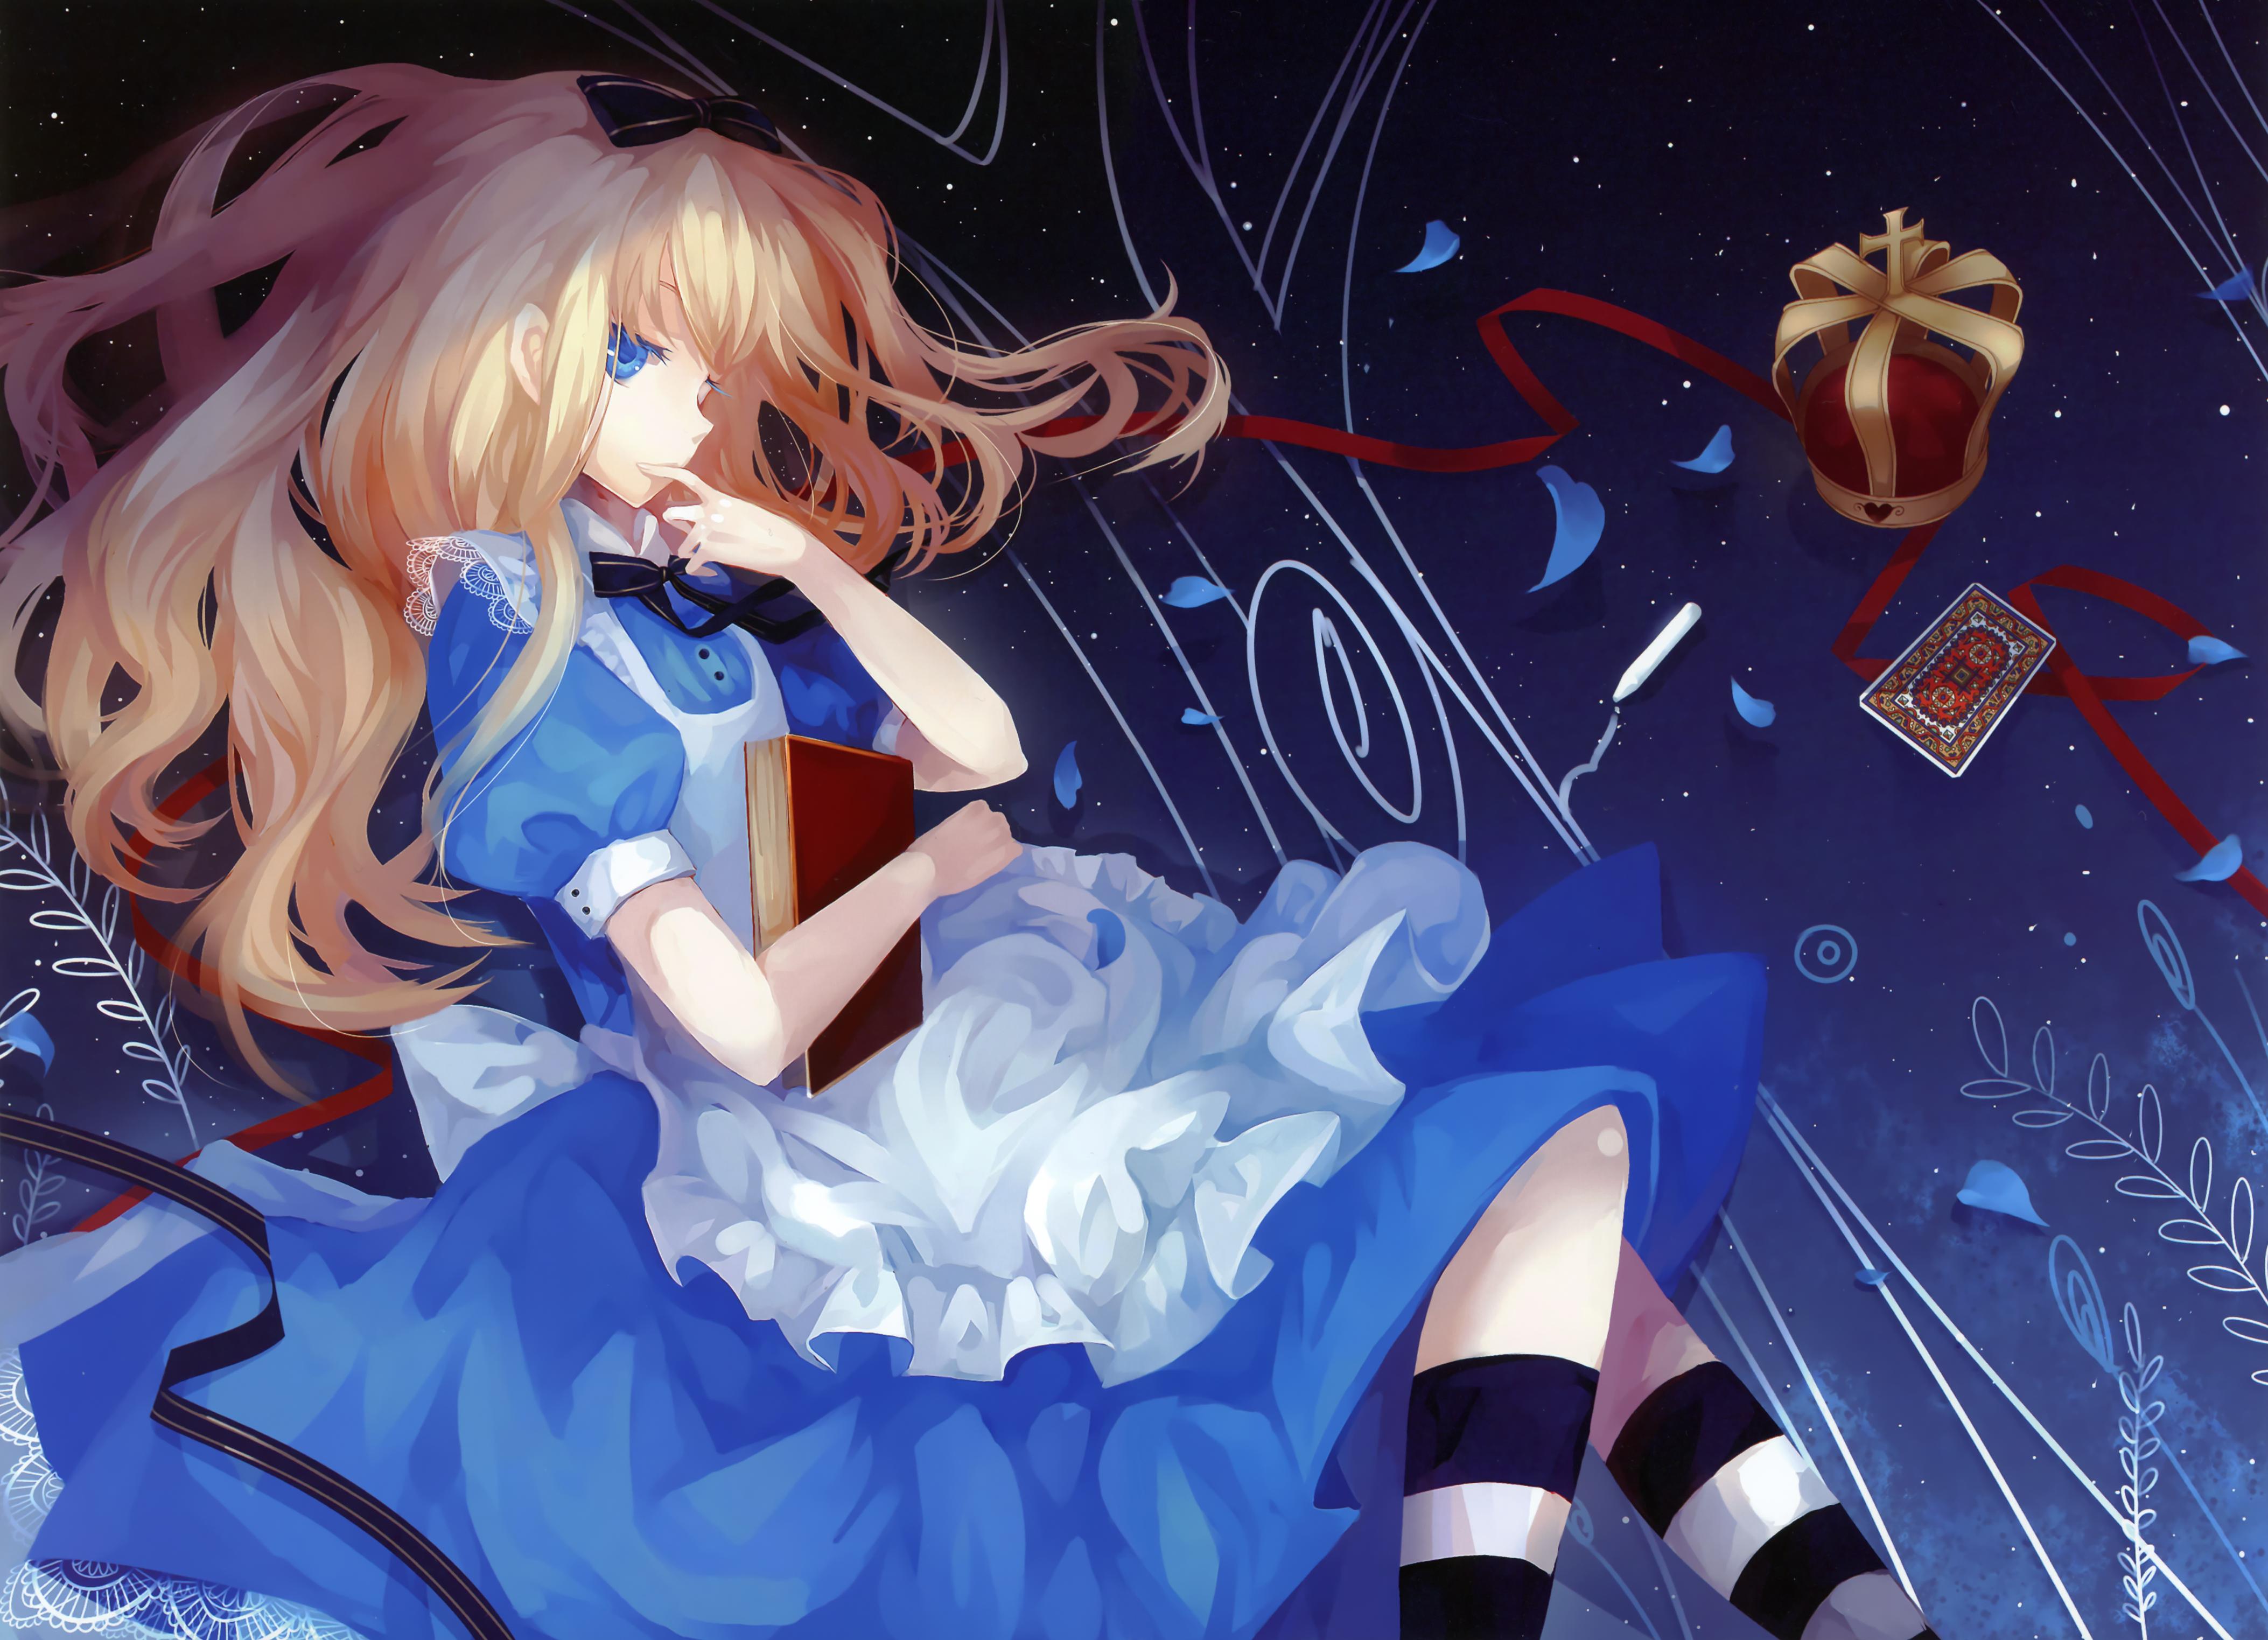 Alice alice in wonderland zerochan anime image board for Zerochan anime